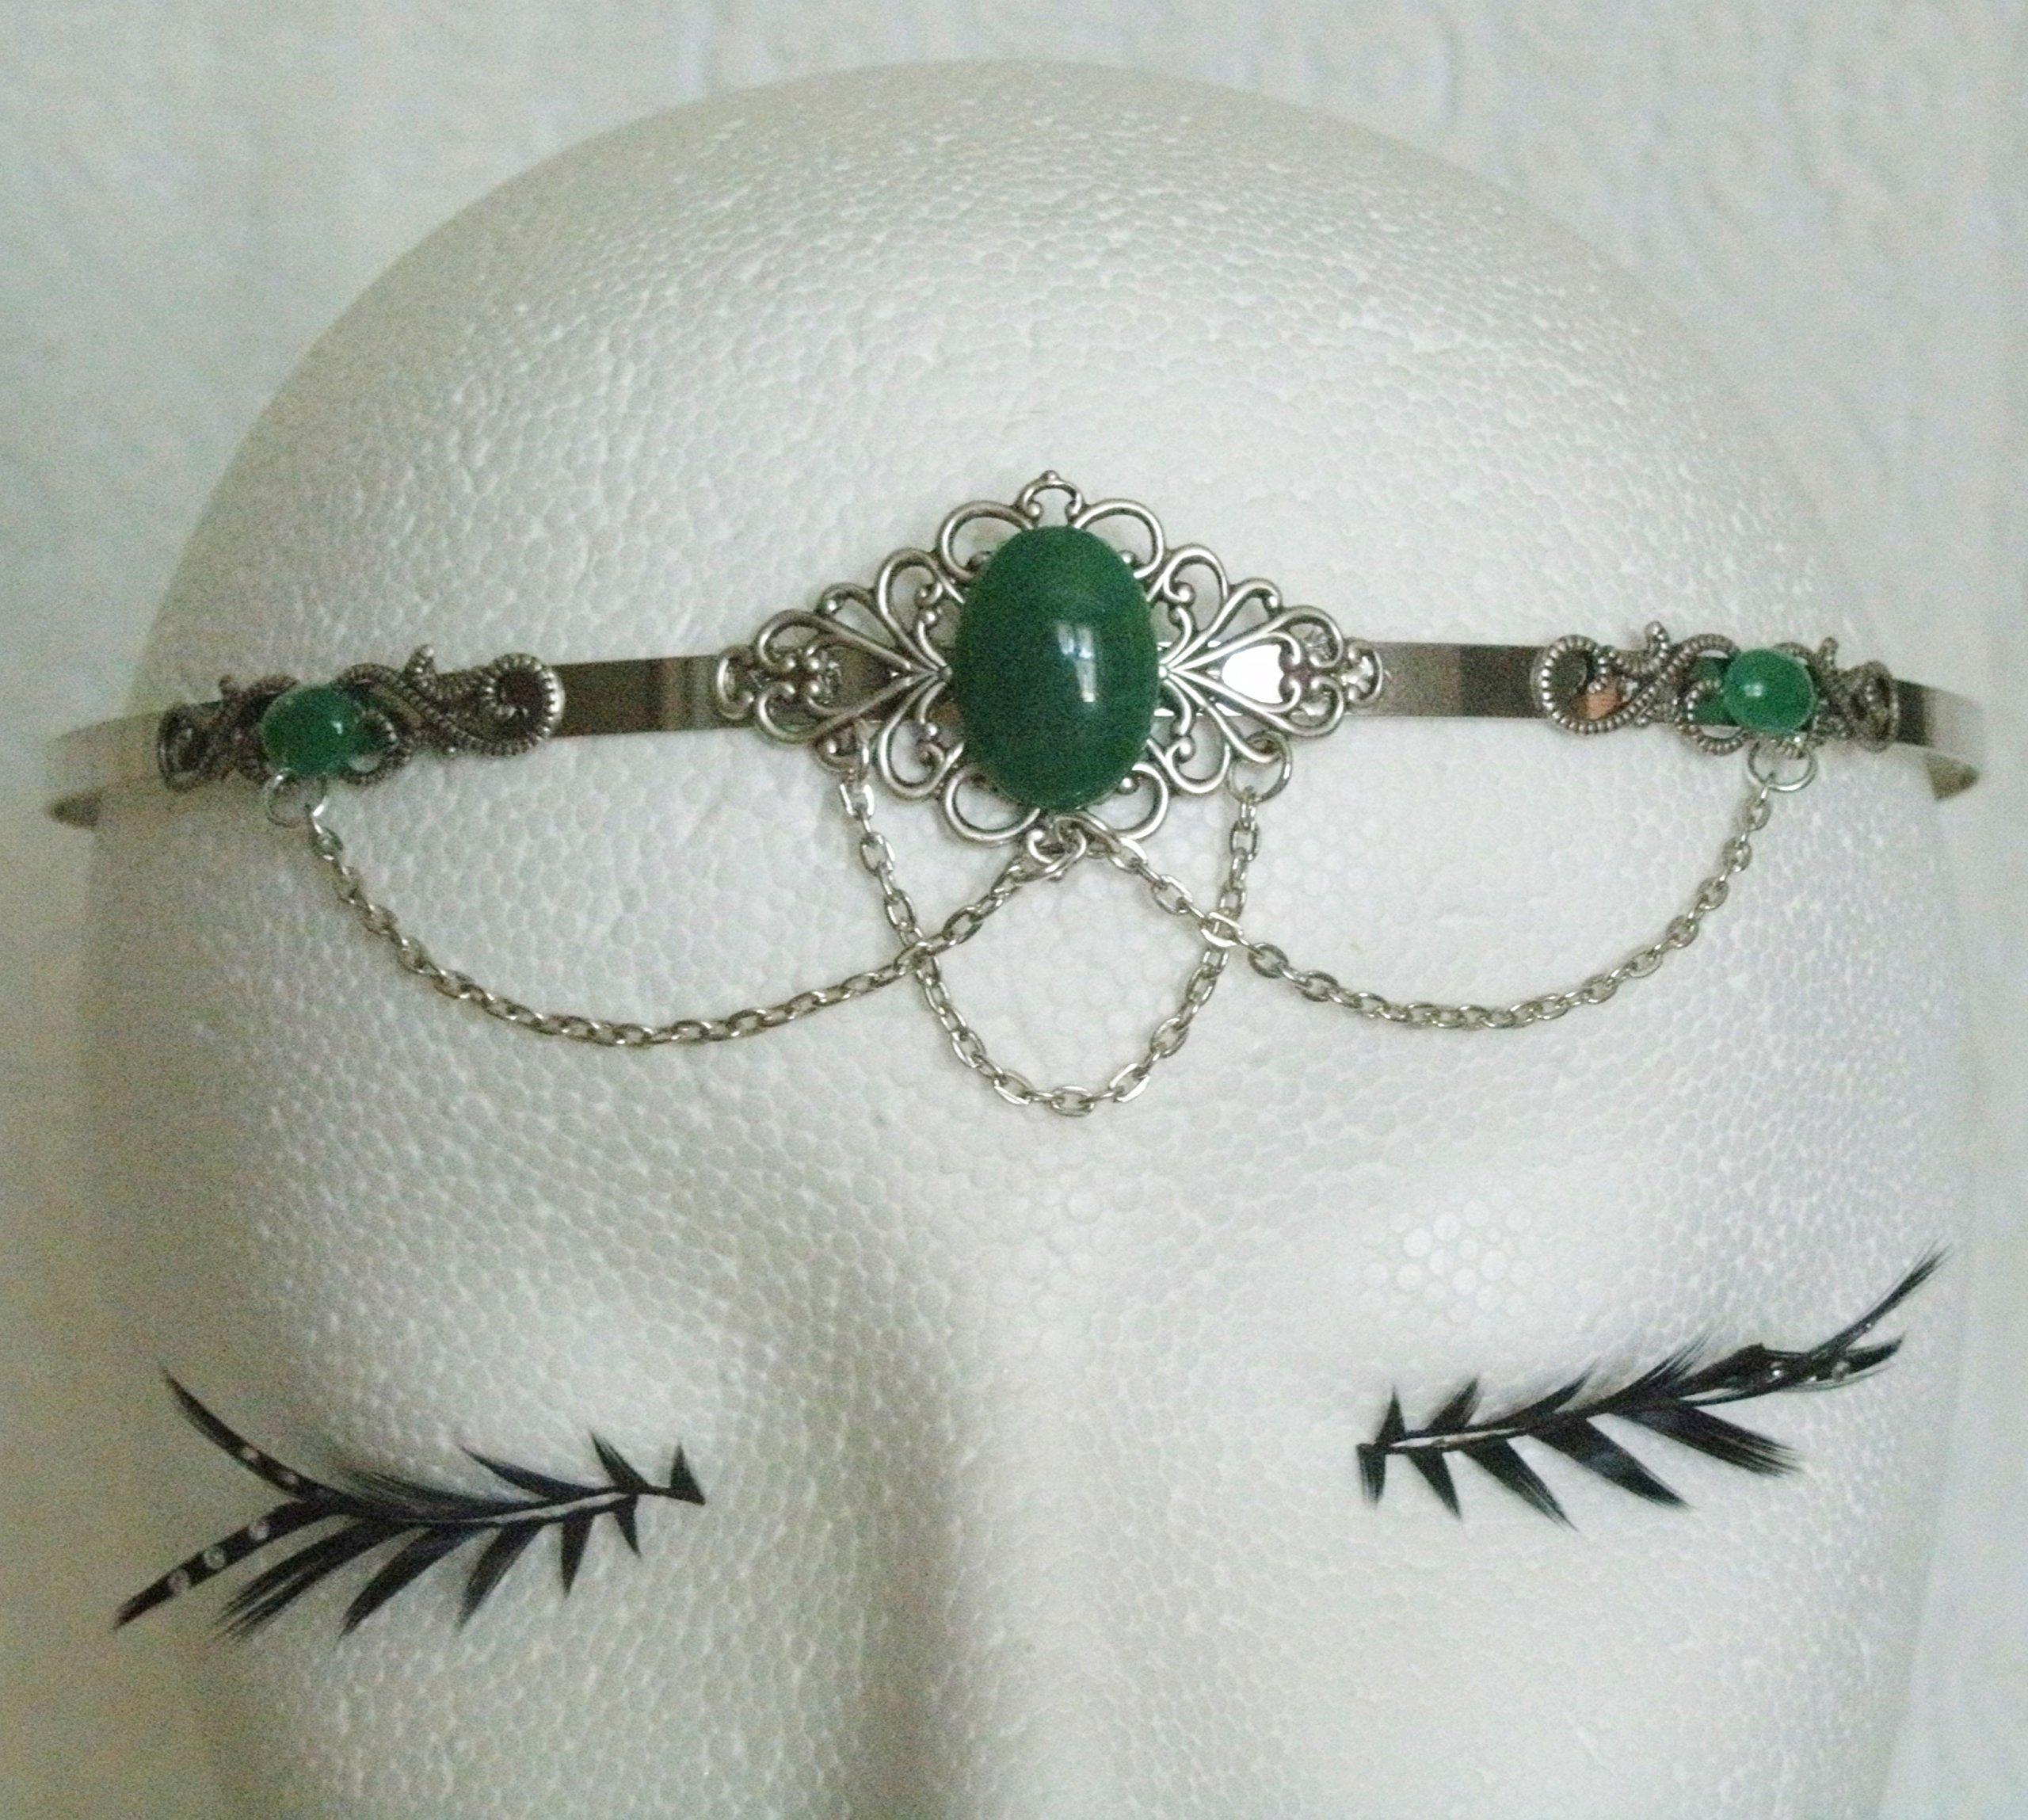 Green Agate Circlet, handmade jewelry renaissance medieval Victorian Edwardian art nouveau art deco tudor celtic headpiece